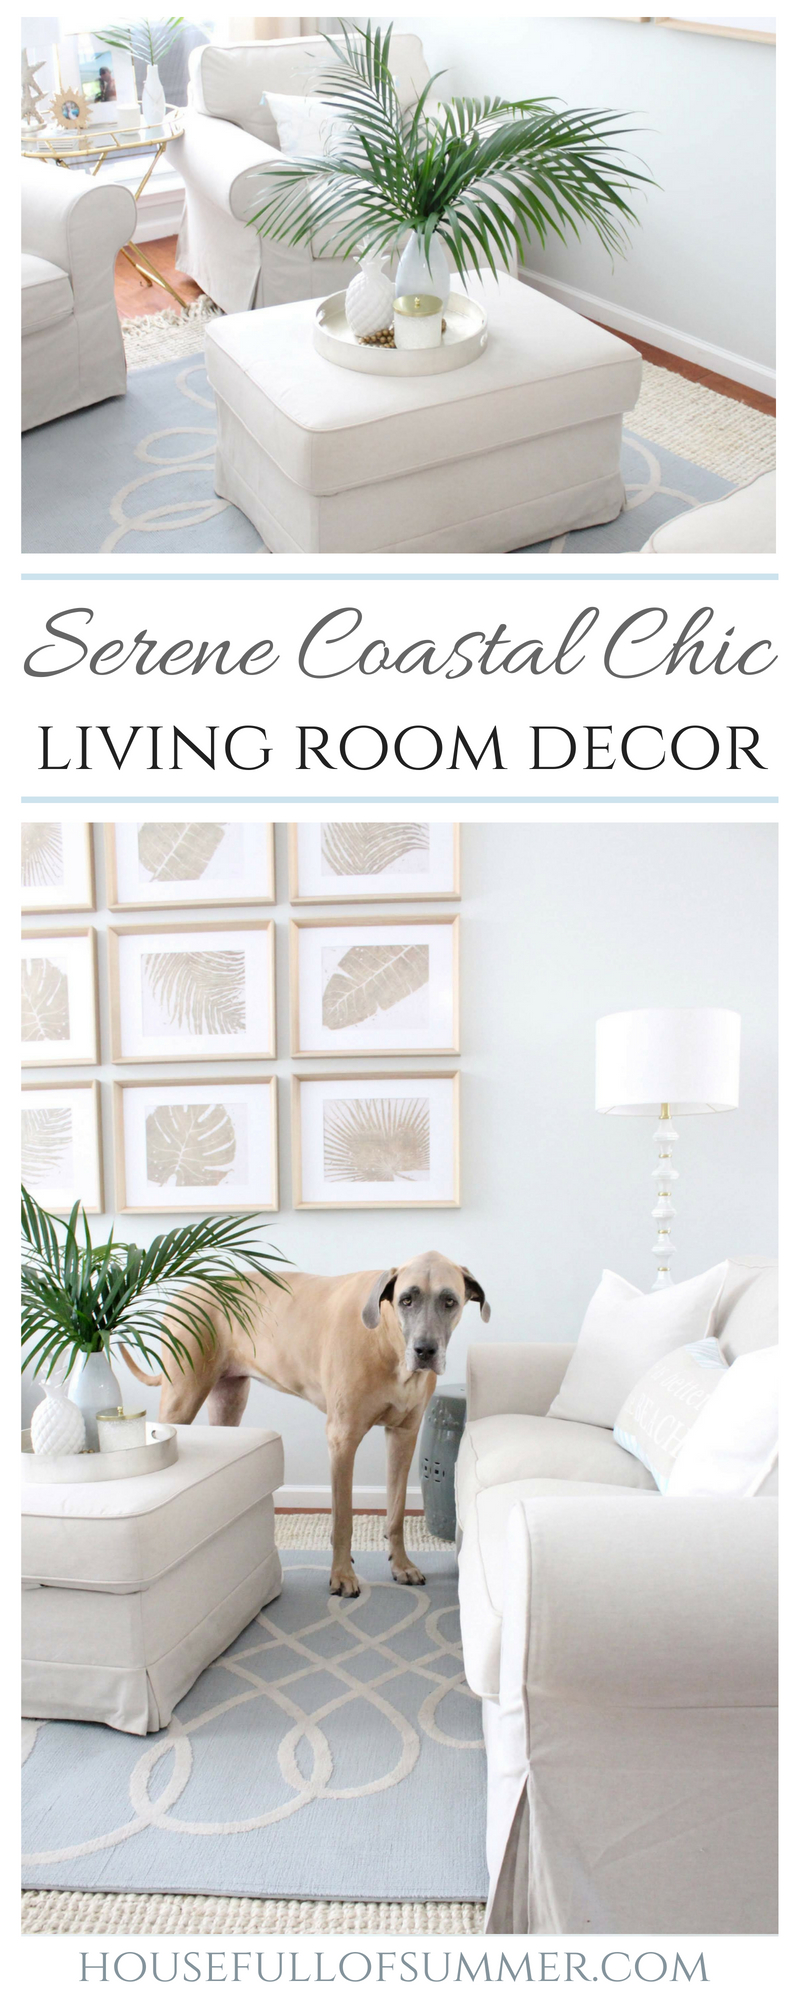 Serene Coastal Chic Living Room Decor | House Full Of Summer Coastal Home  Interior, Palm